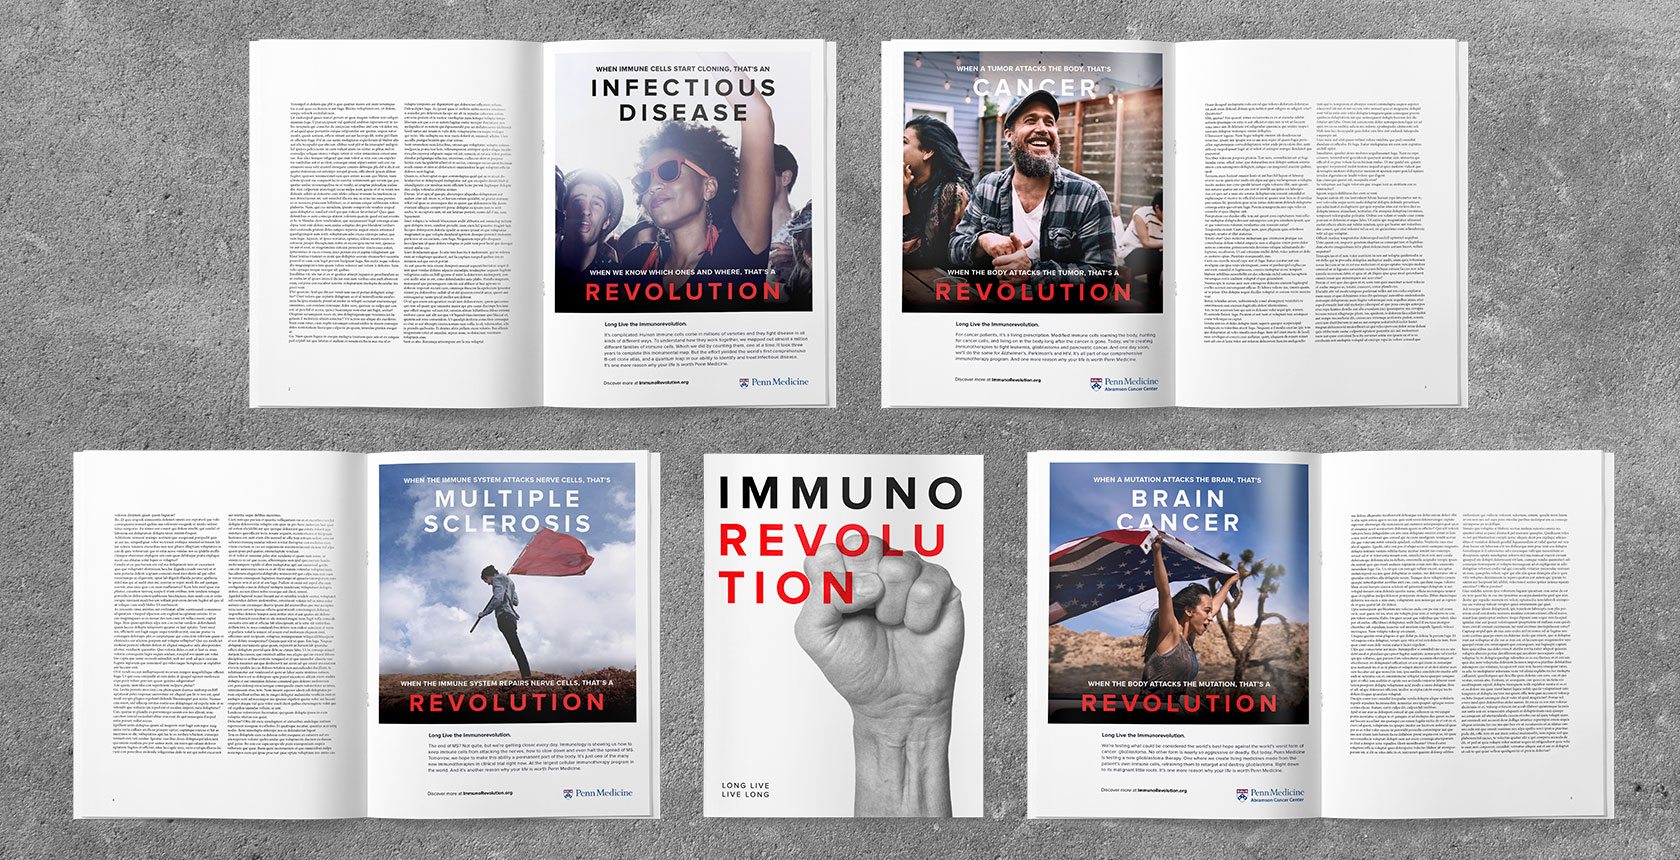 Brett_Ruiz_Penn_Medicine_Immunorevolution_Print_Collection.jpg